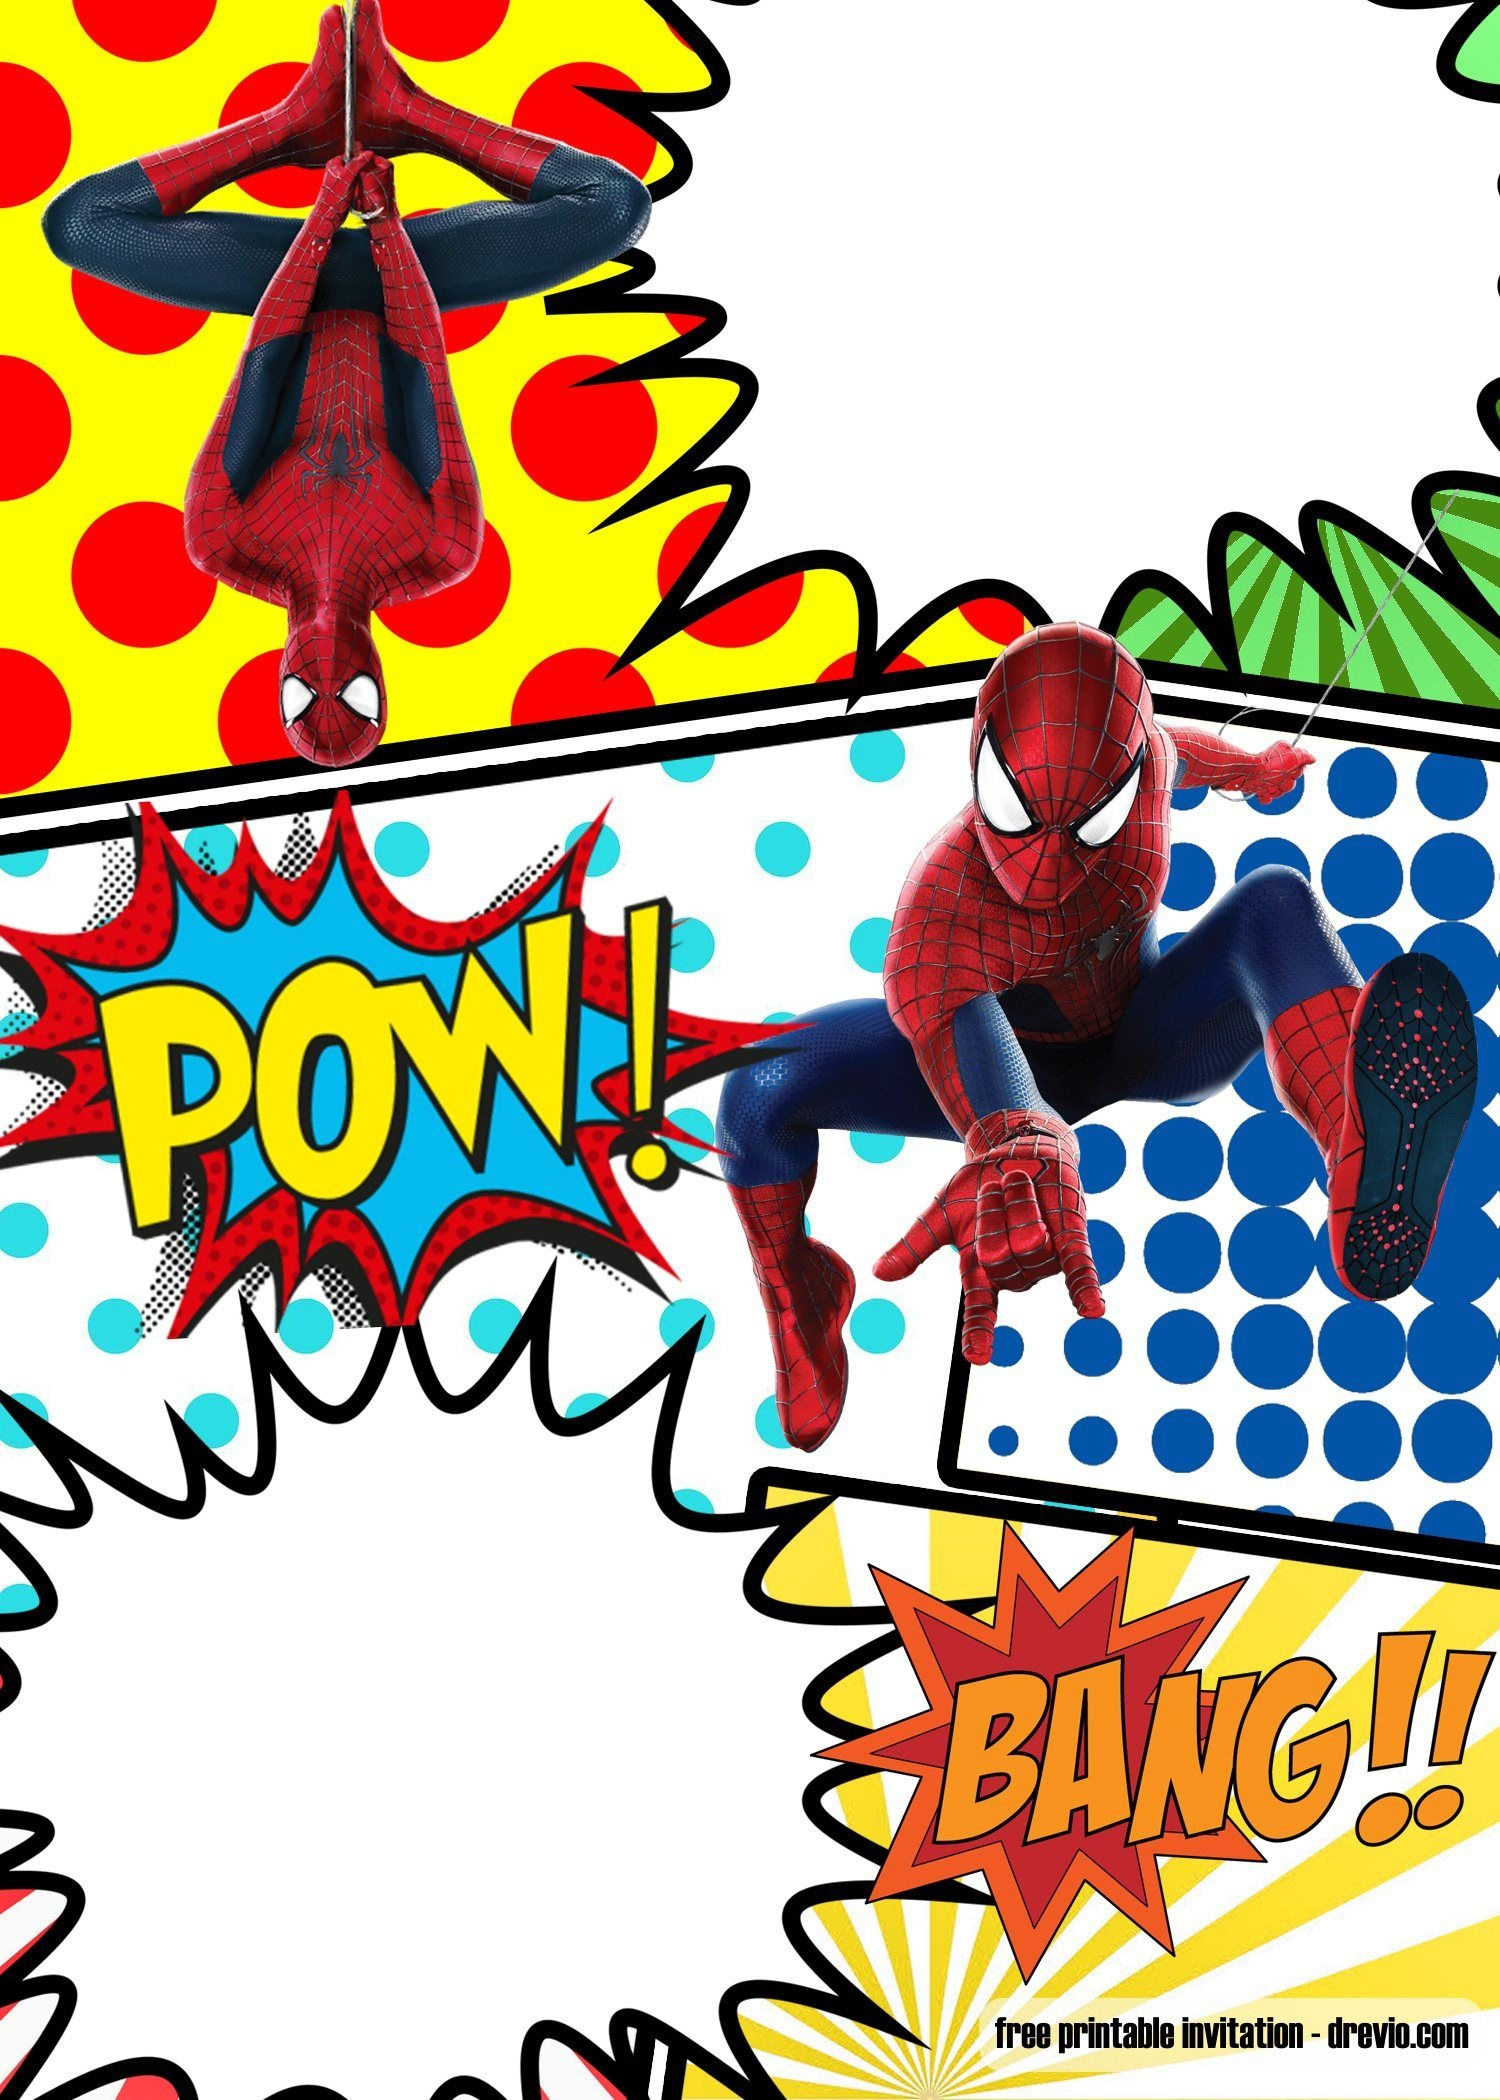 Free Marvel Spiderman Comic Style Invitation Template | Partying - Free Printable Superhero Birthday Invitation Templates